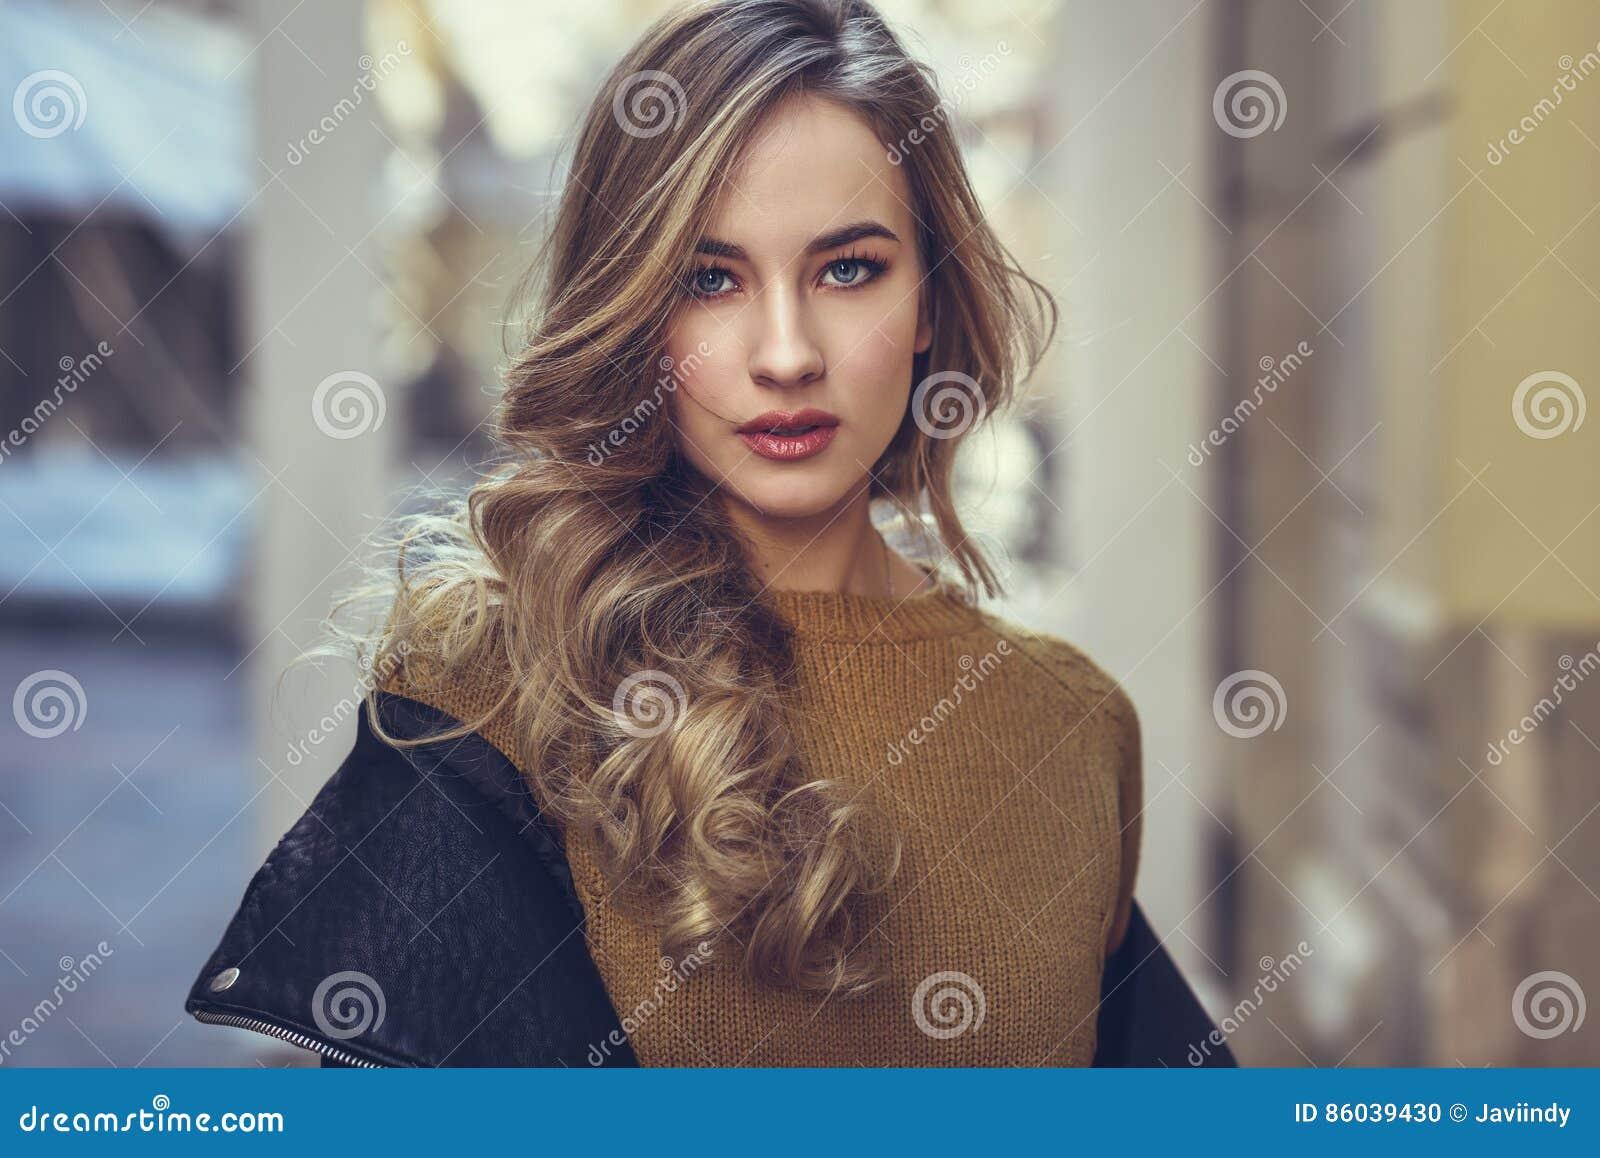 Esposa rusa complaciendo al marido - Canalpornocom